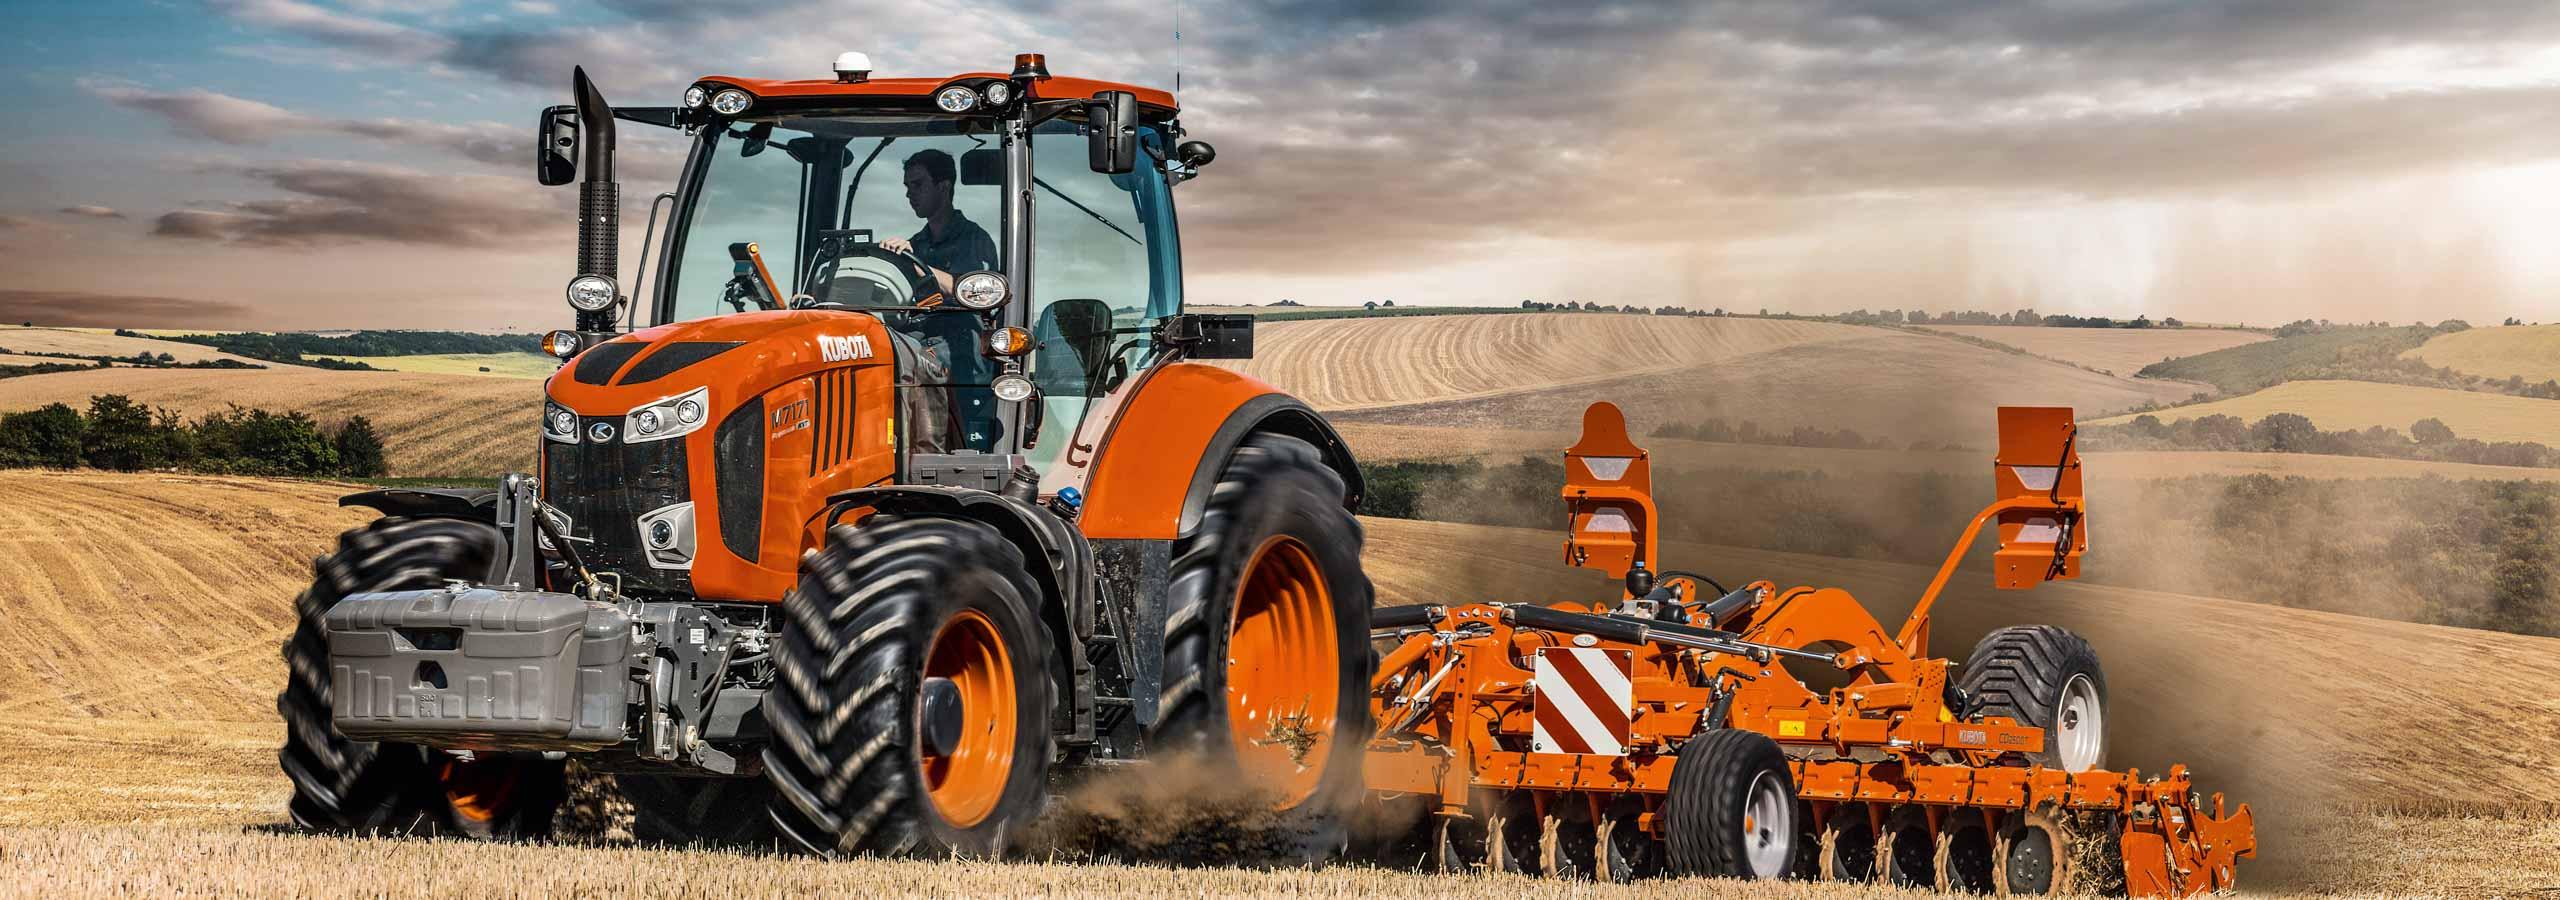 Kubota Traktoren Anbaugeräte